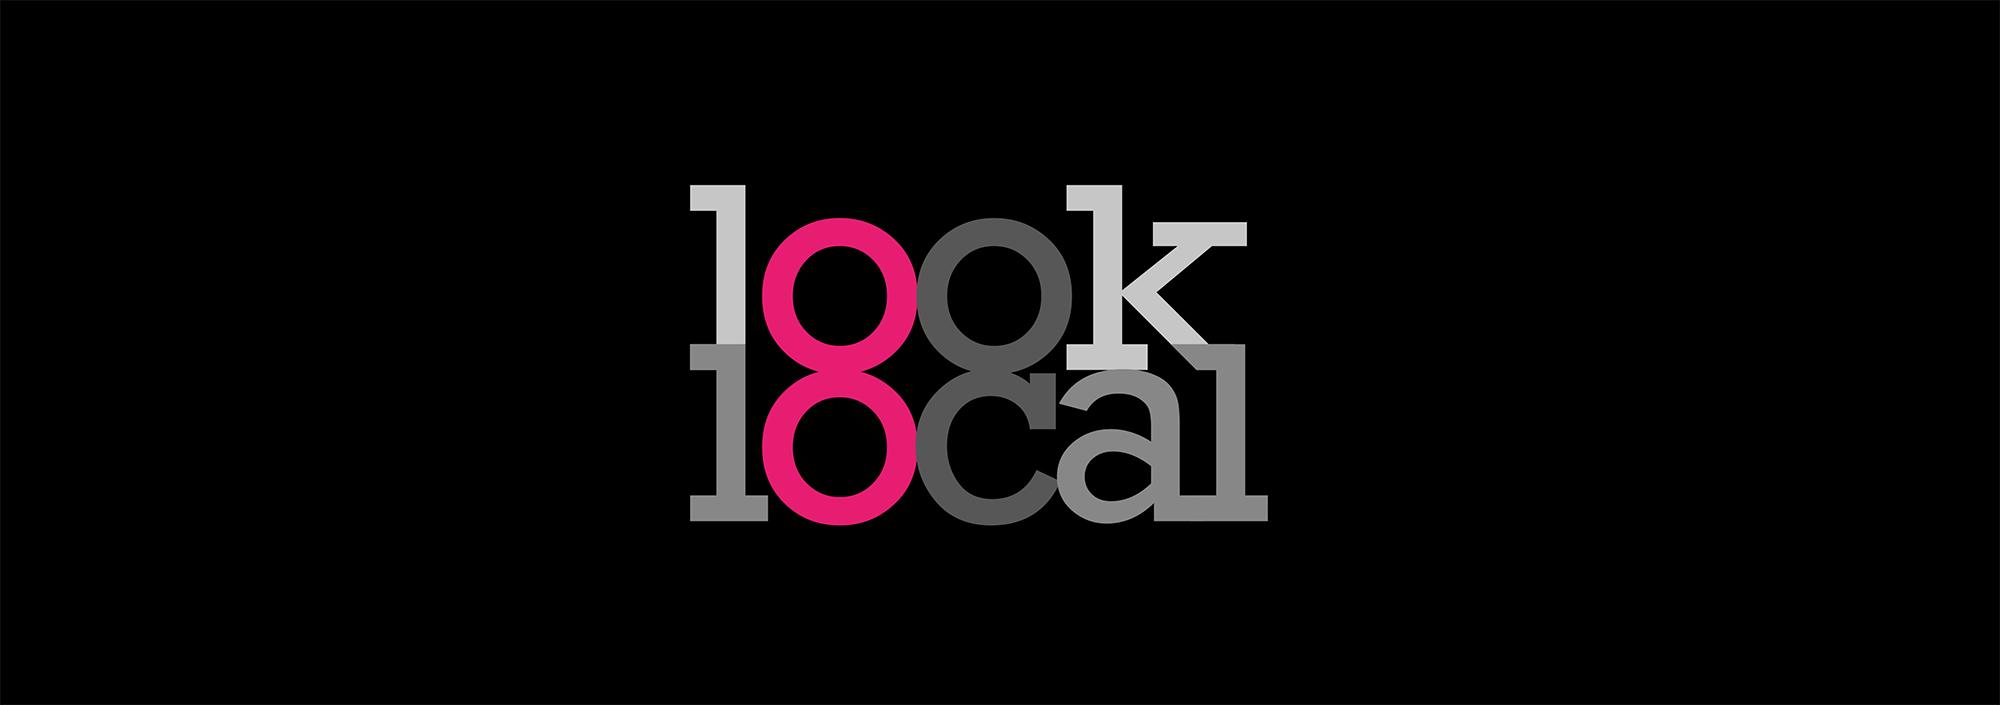 Look Local Logo